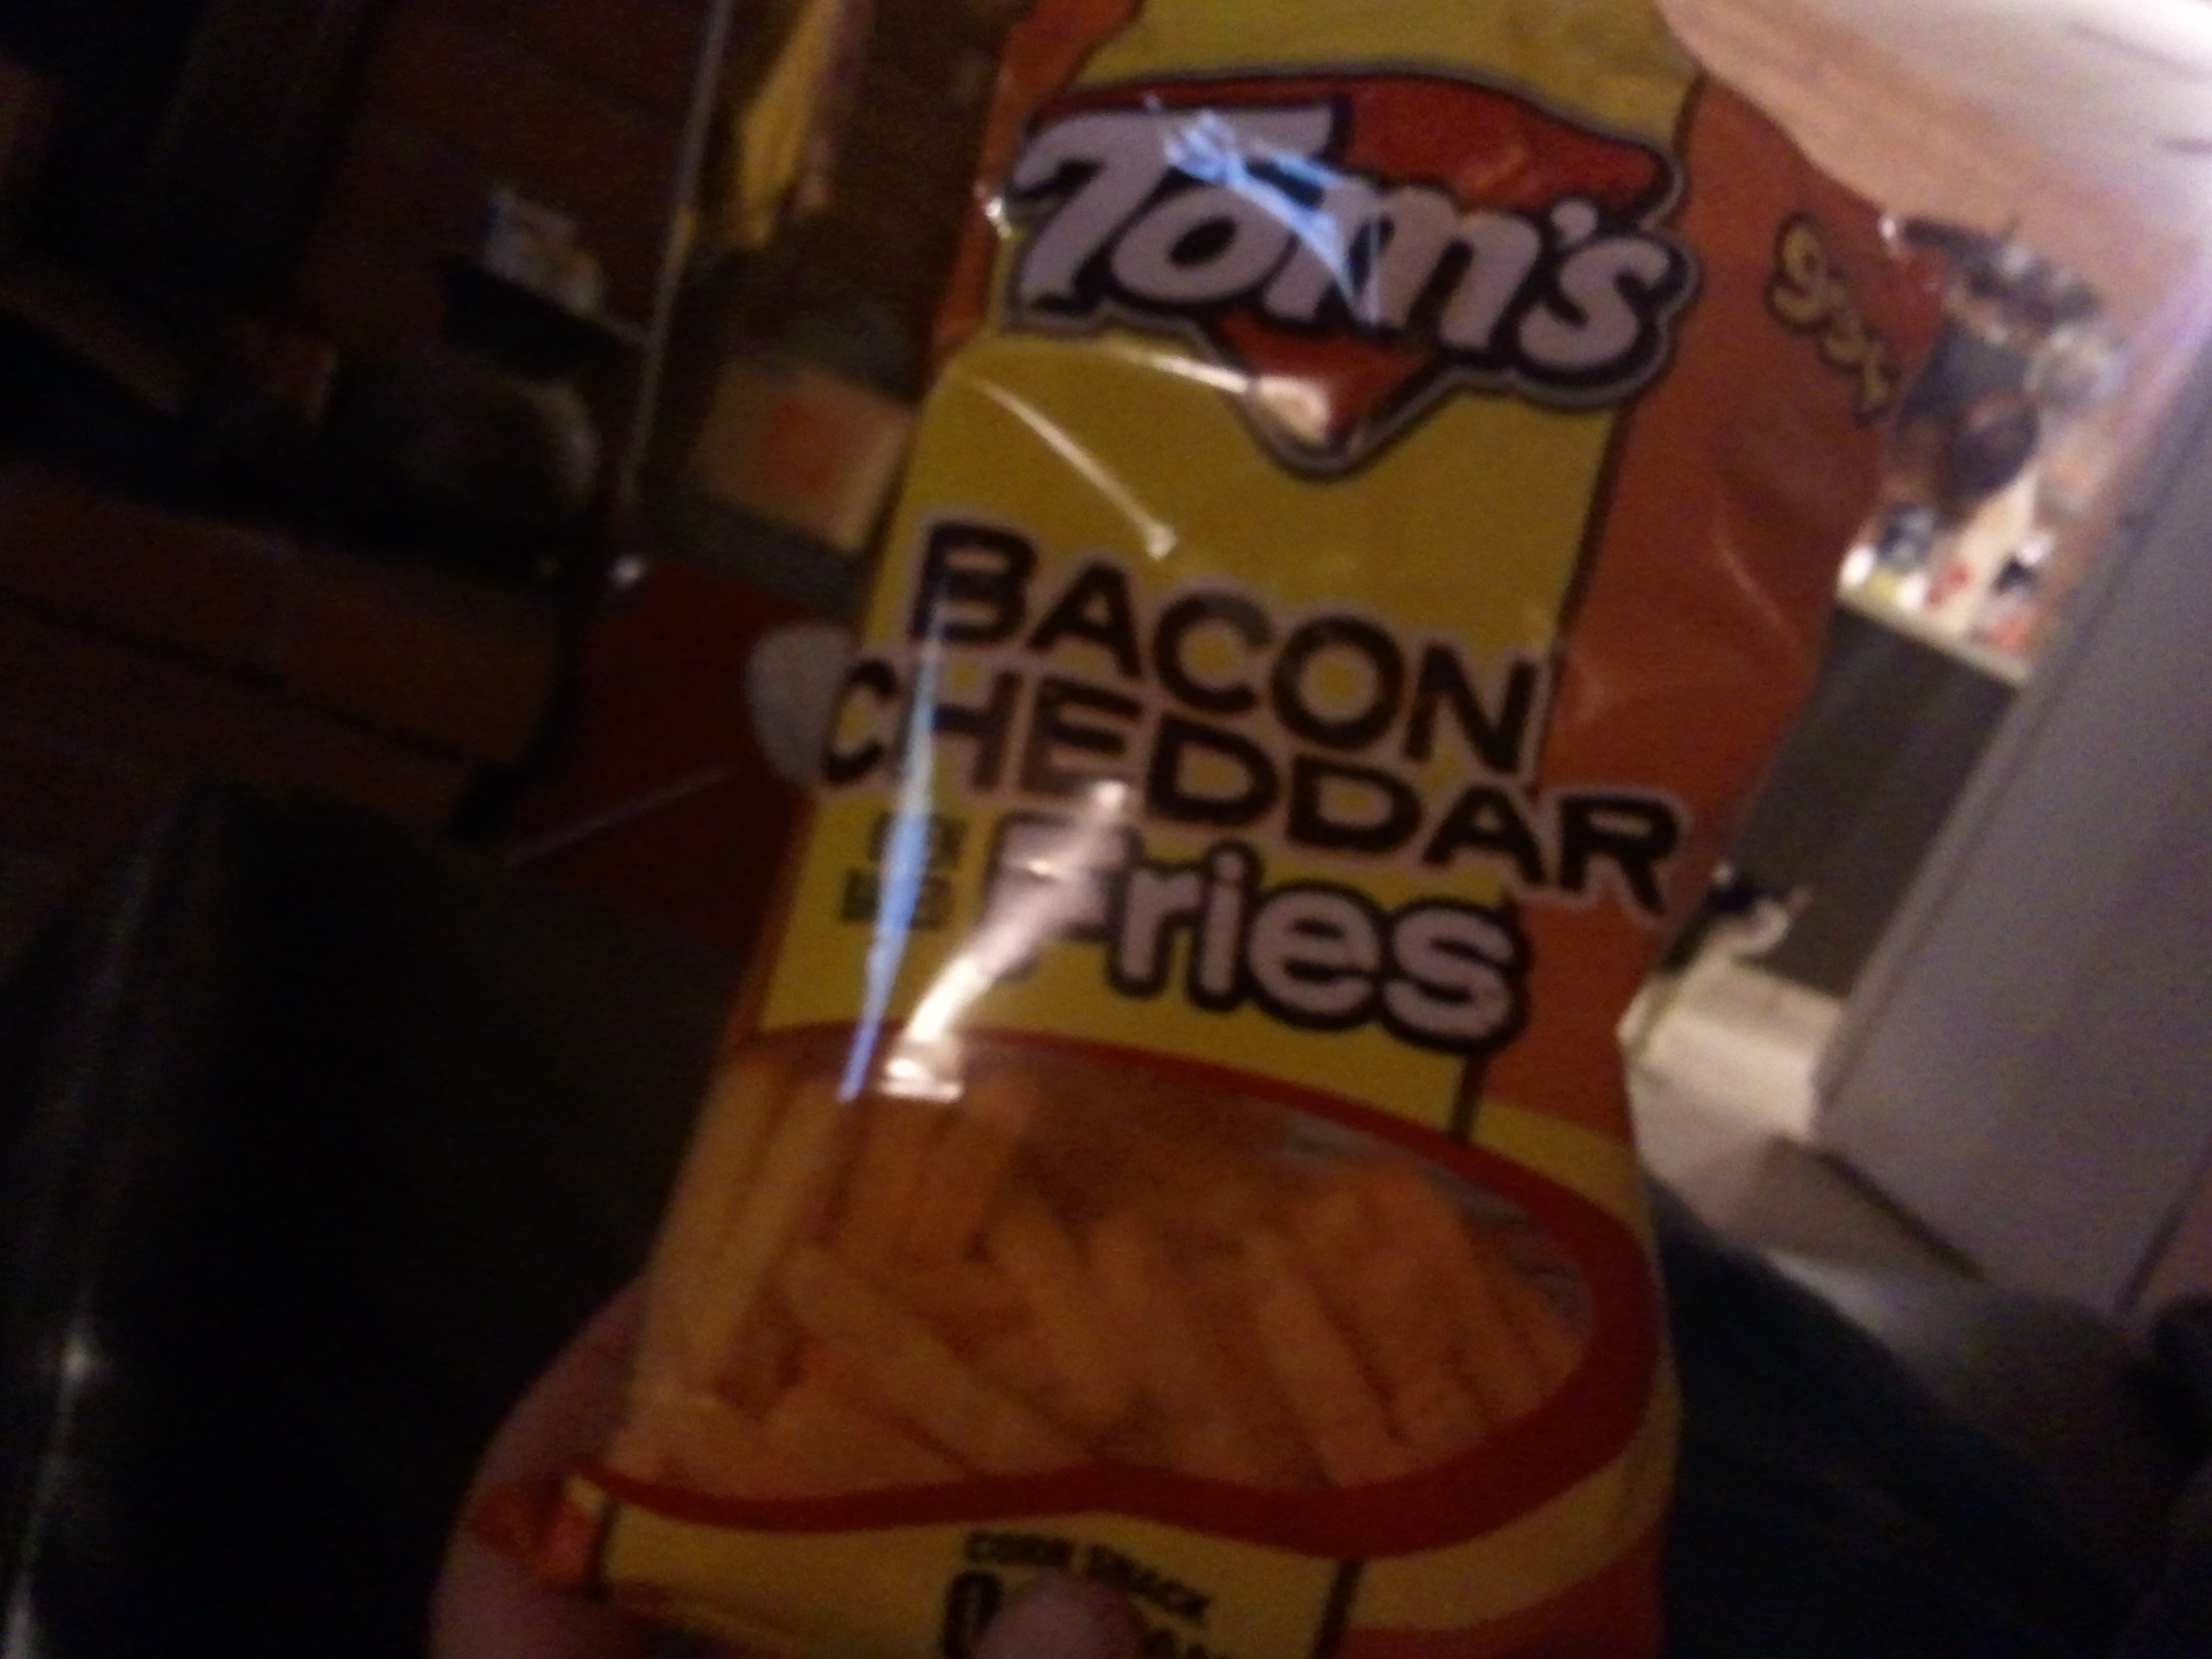 Tom's bacon cheddar fries